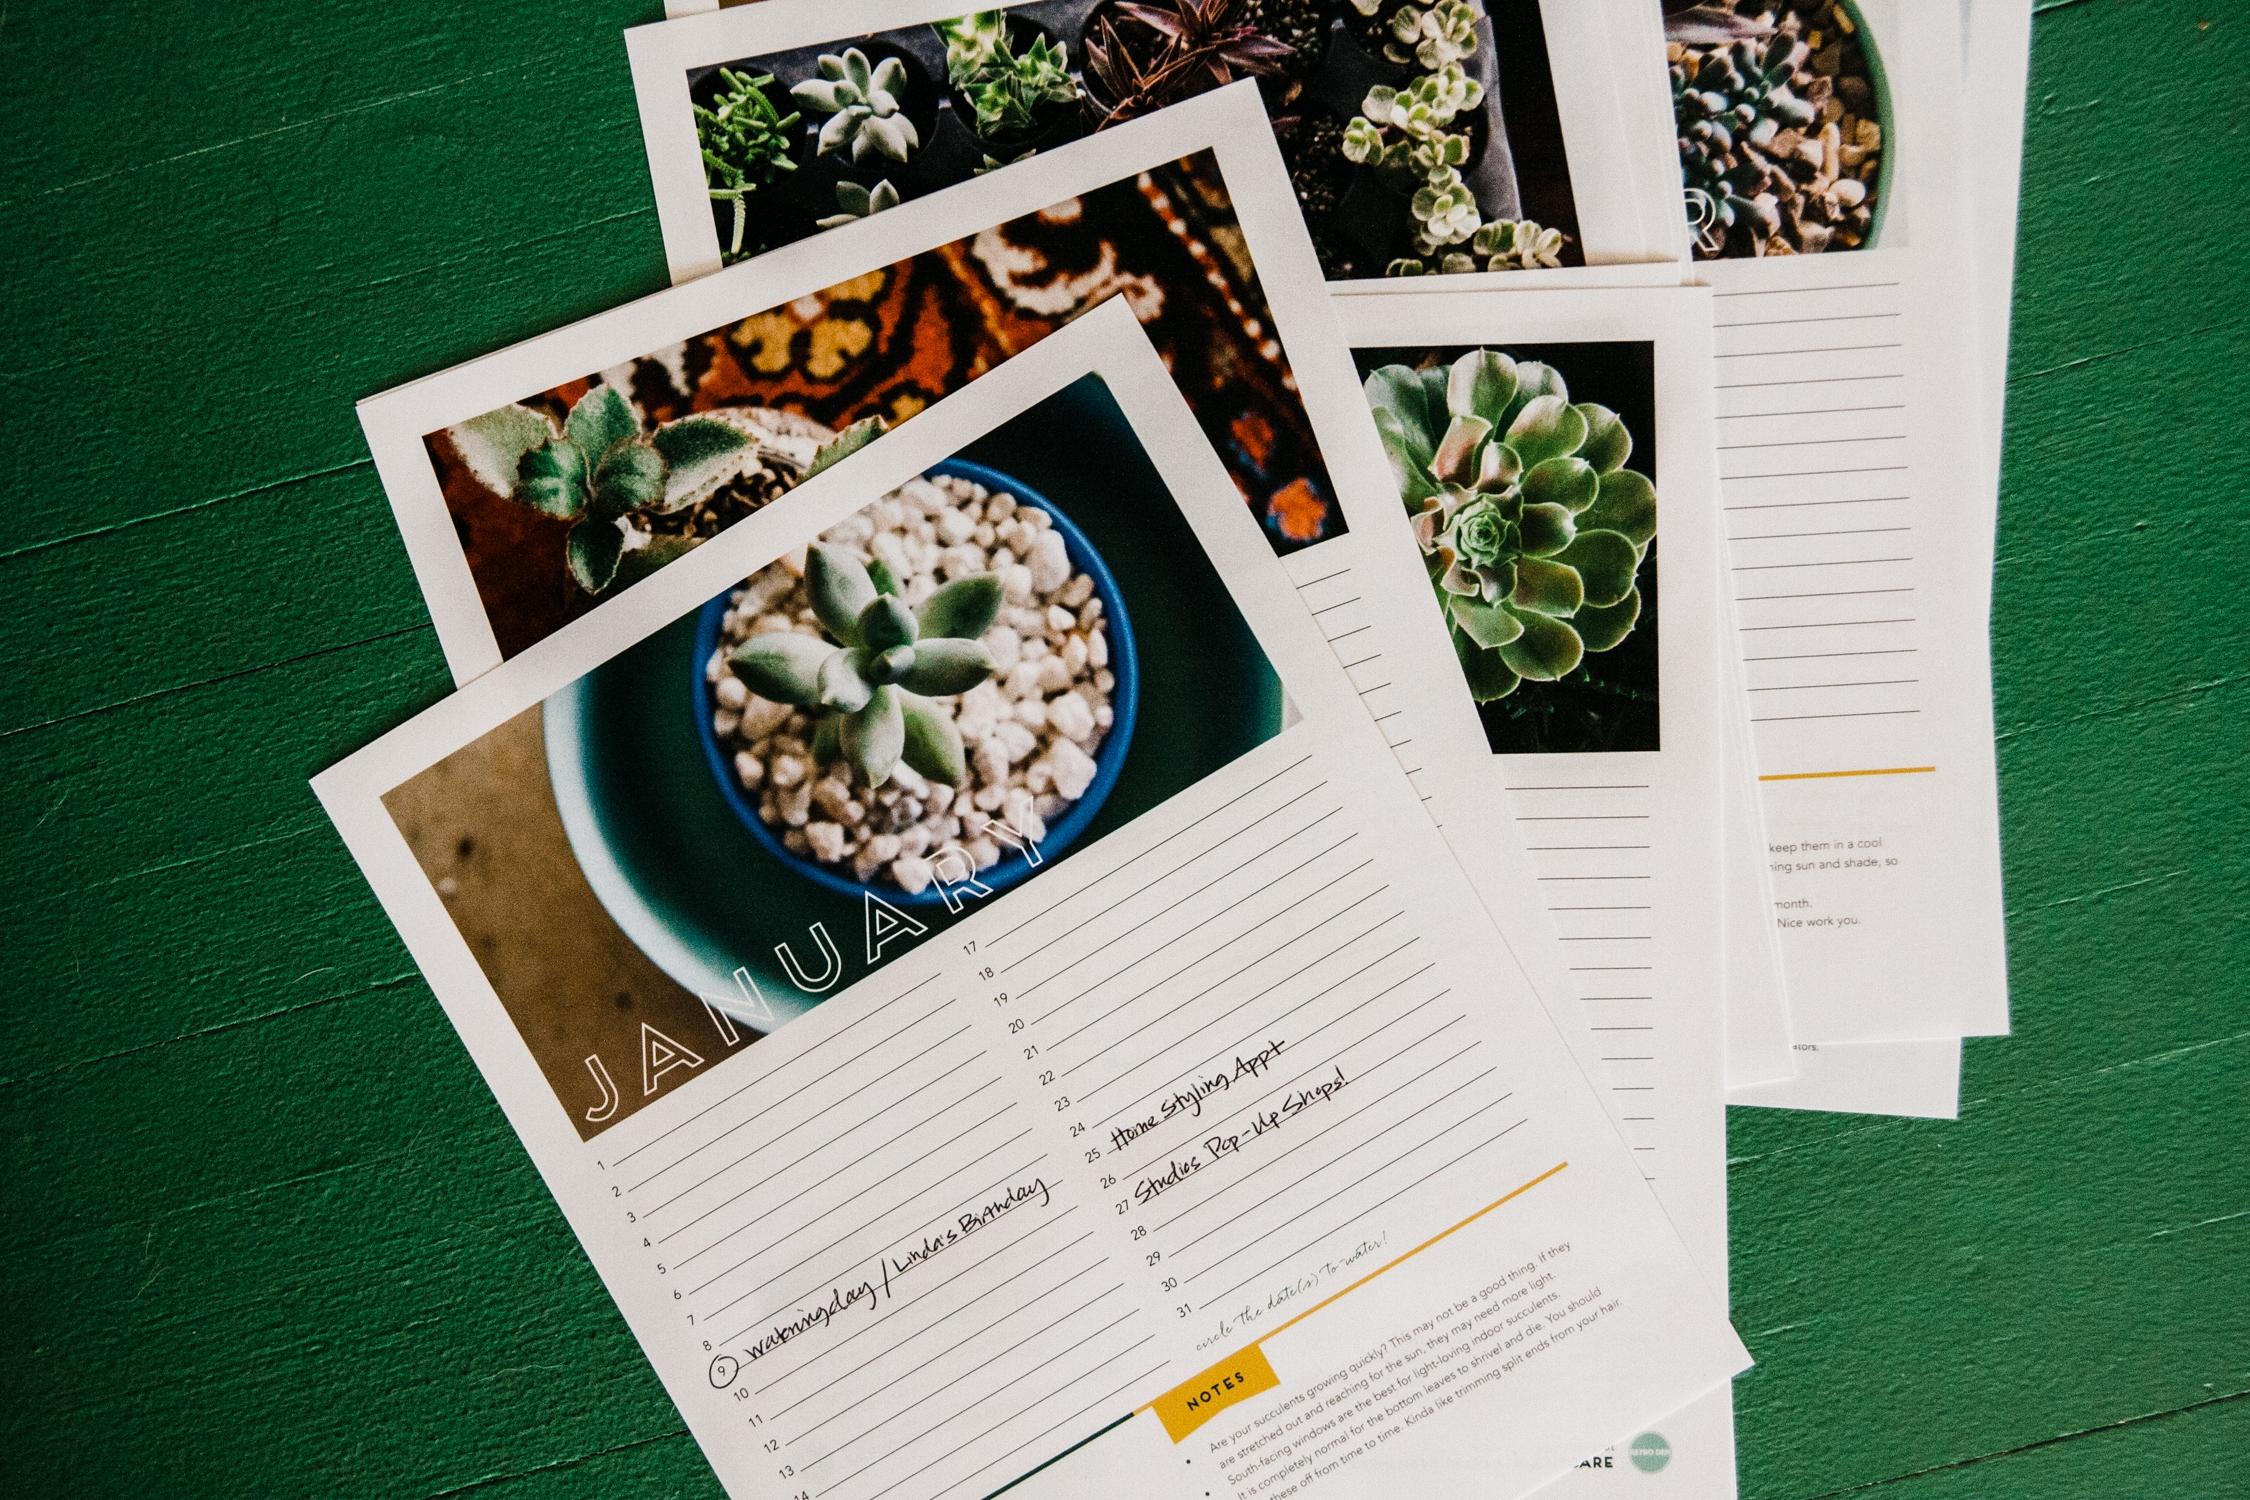 Perpetual-succulent-calendar-2018-13.jpg